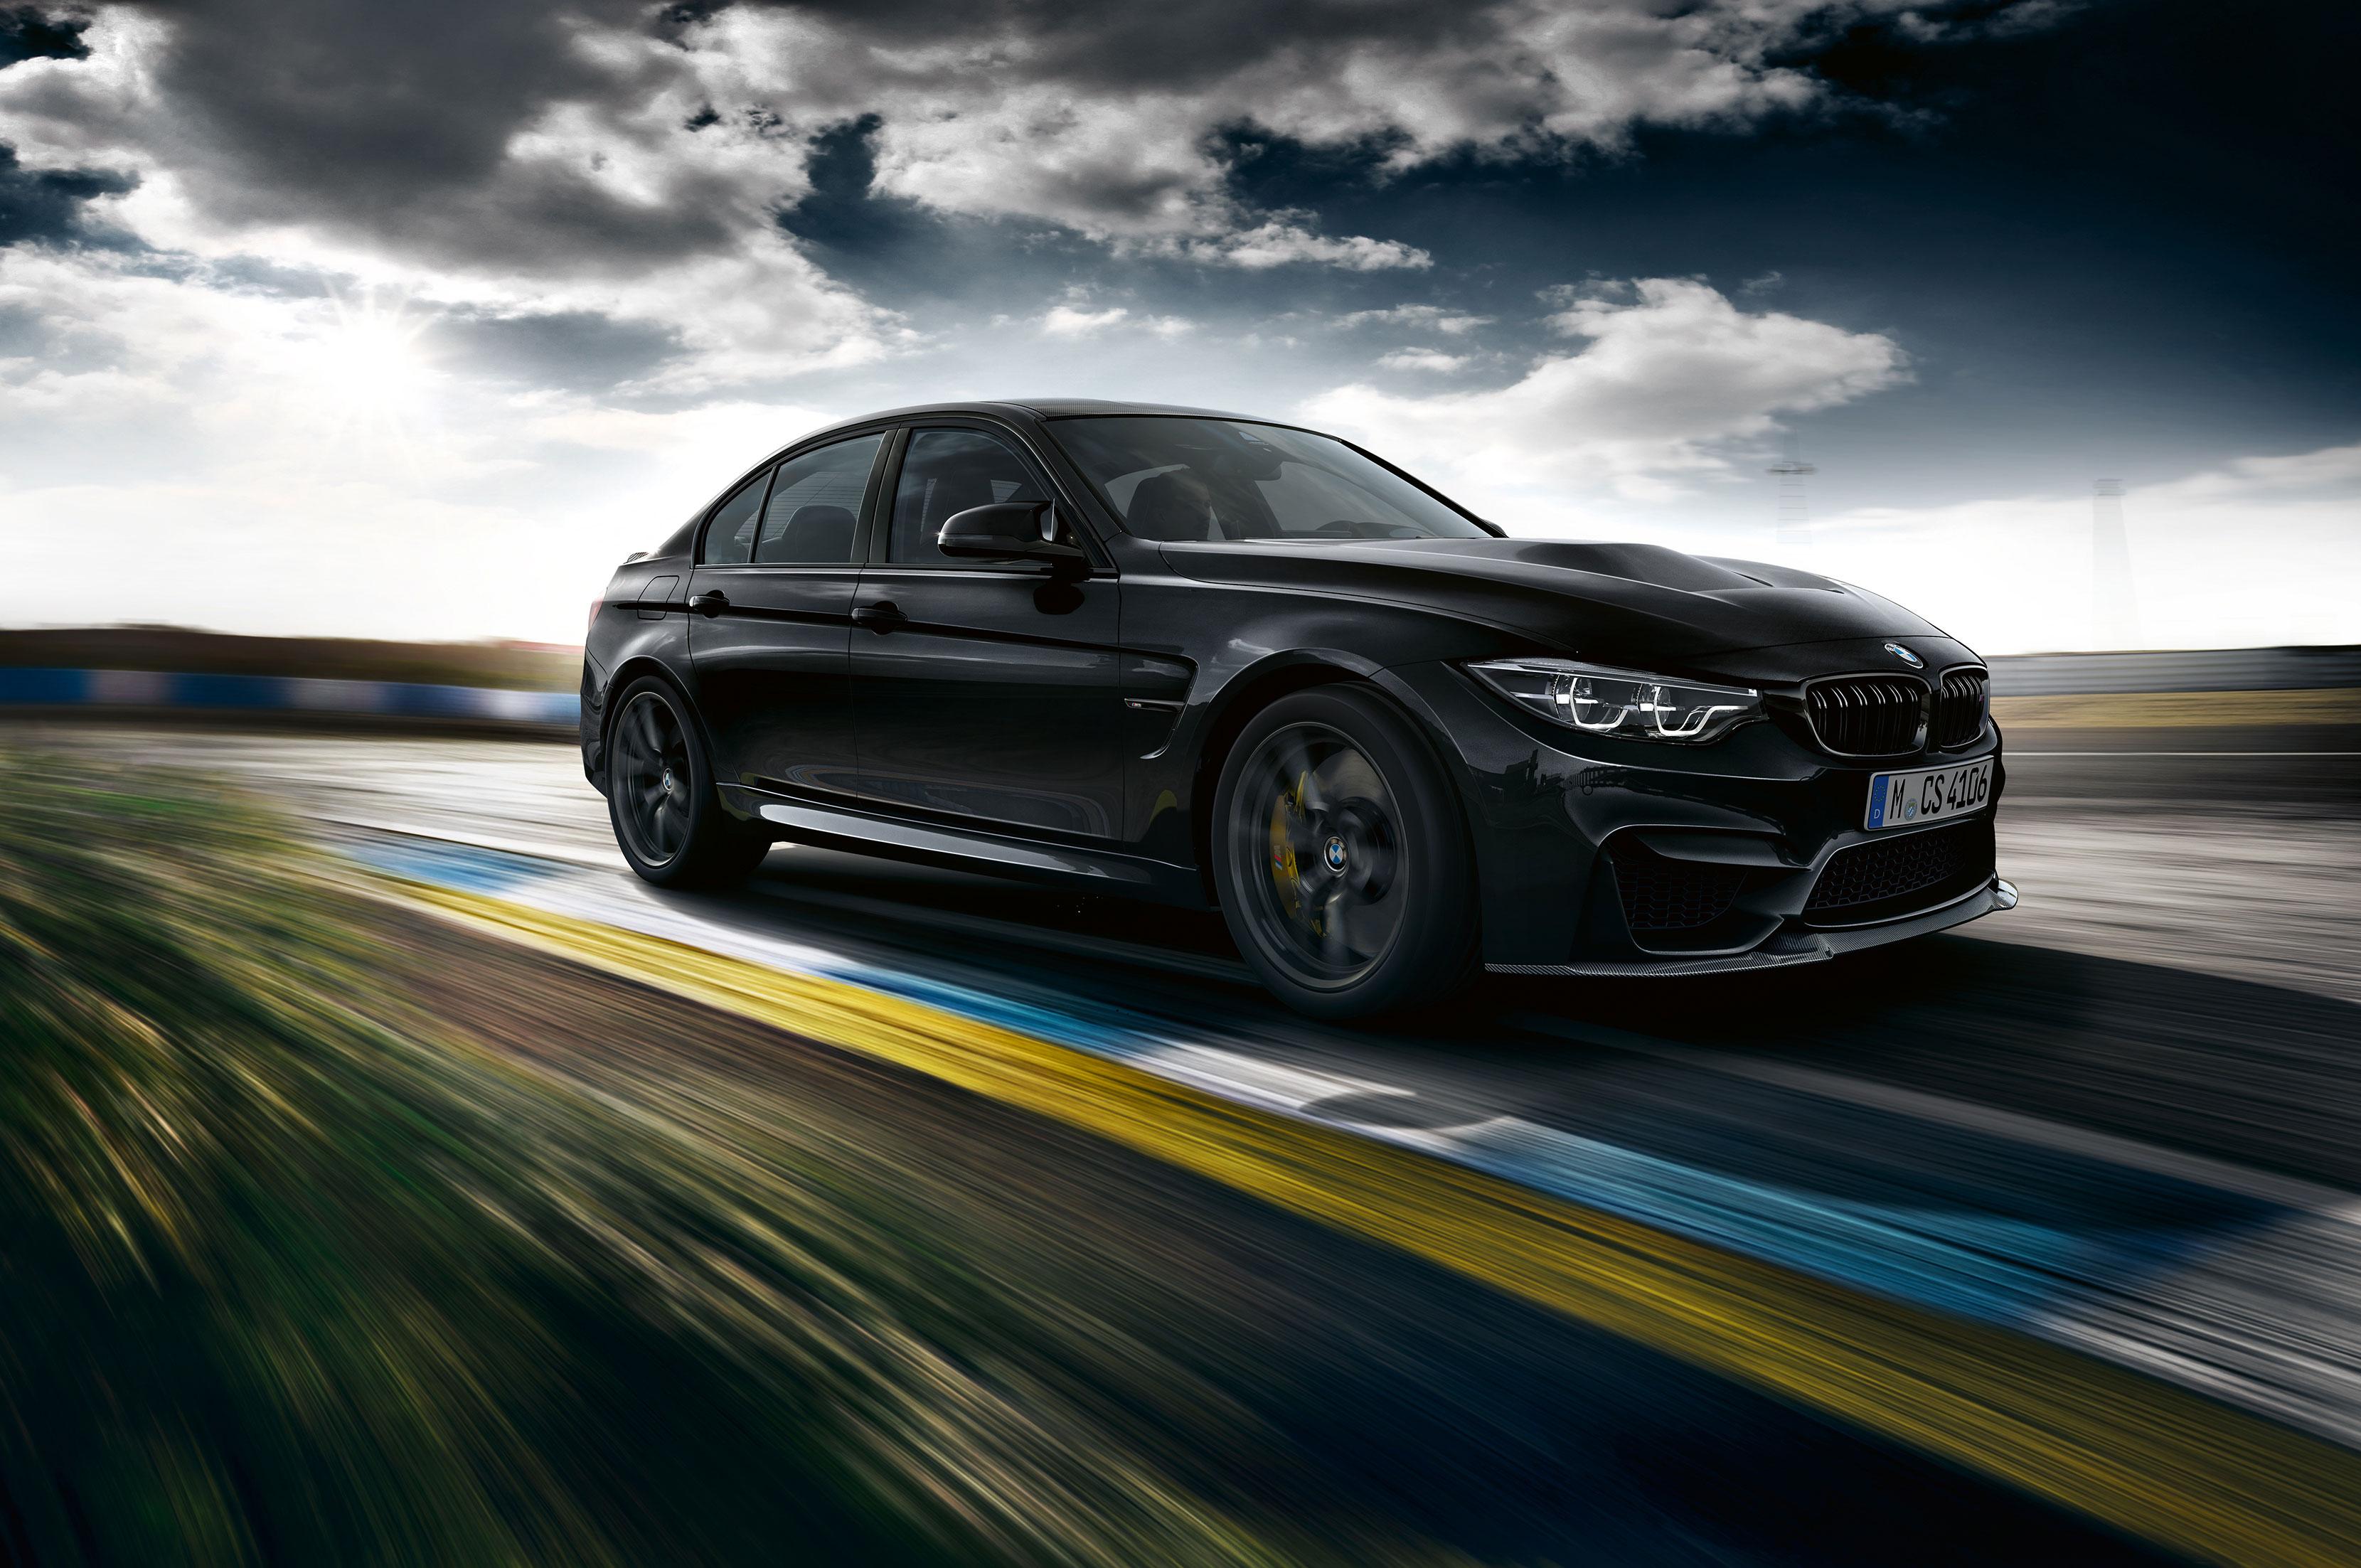 2018 BMW M3 CS Front Three Quarters 2